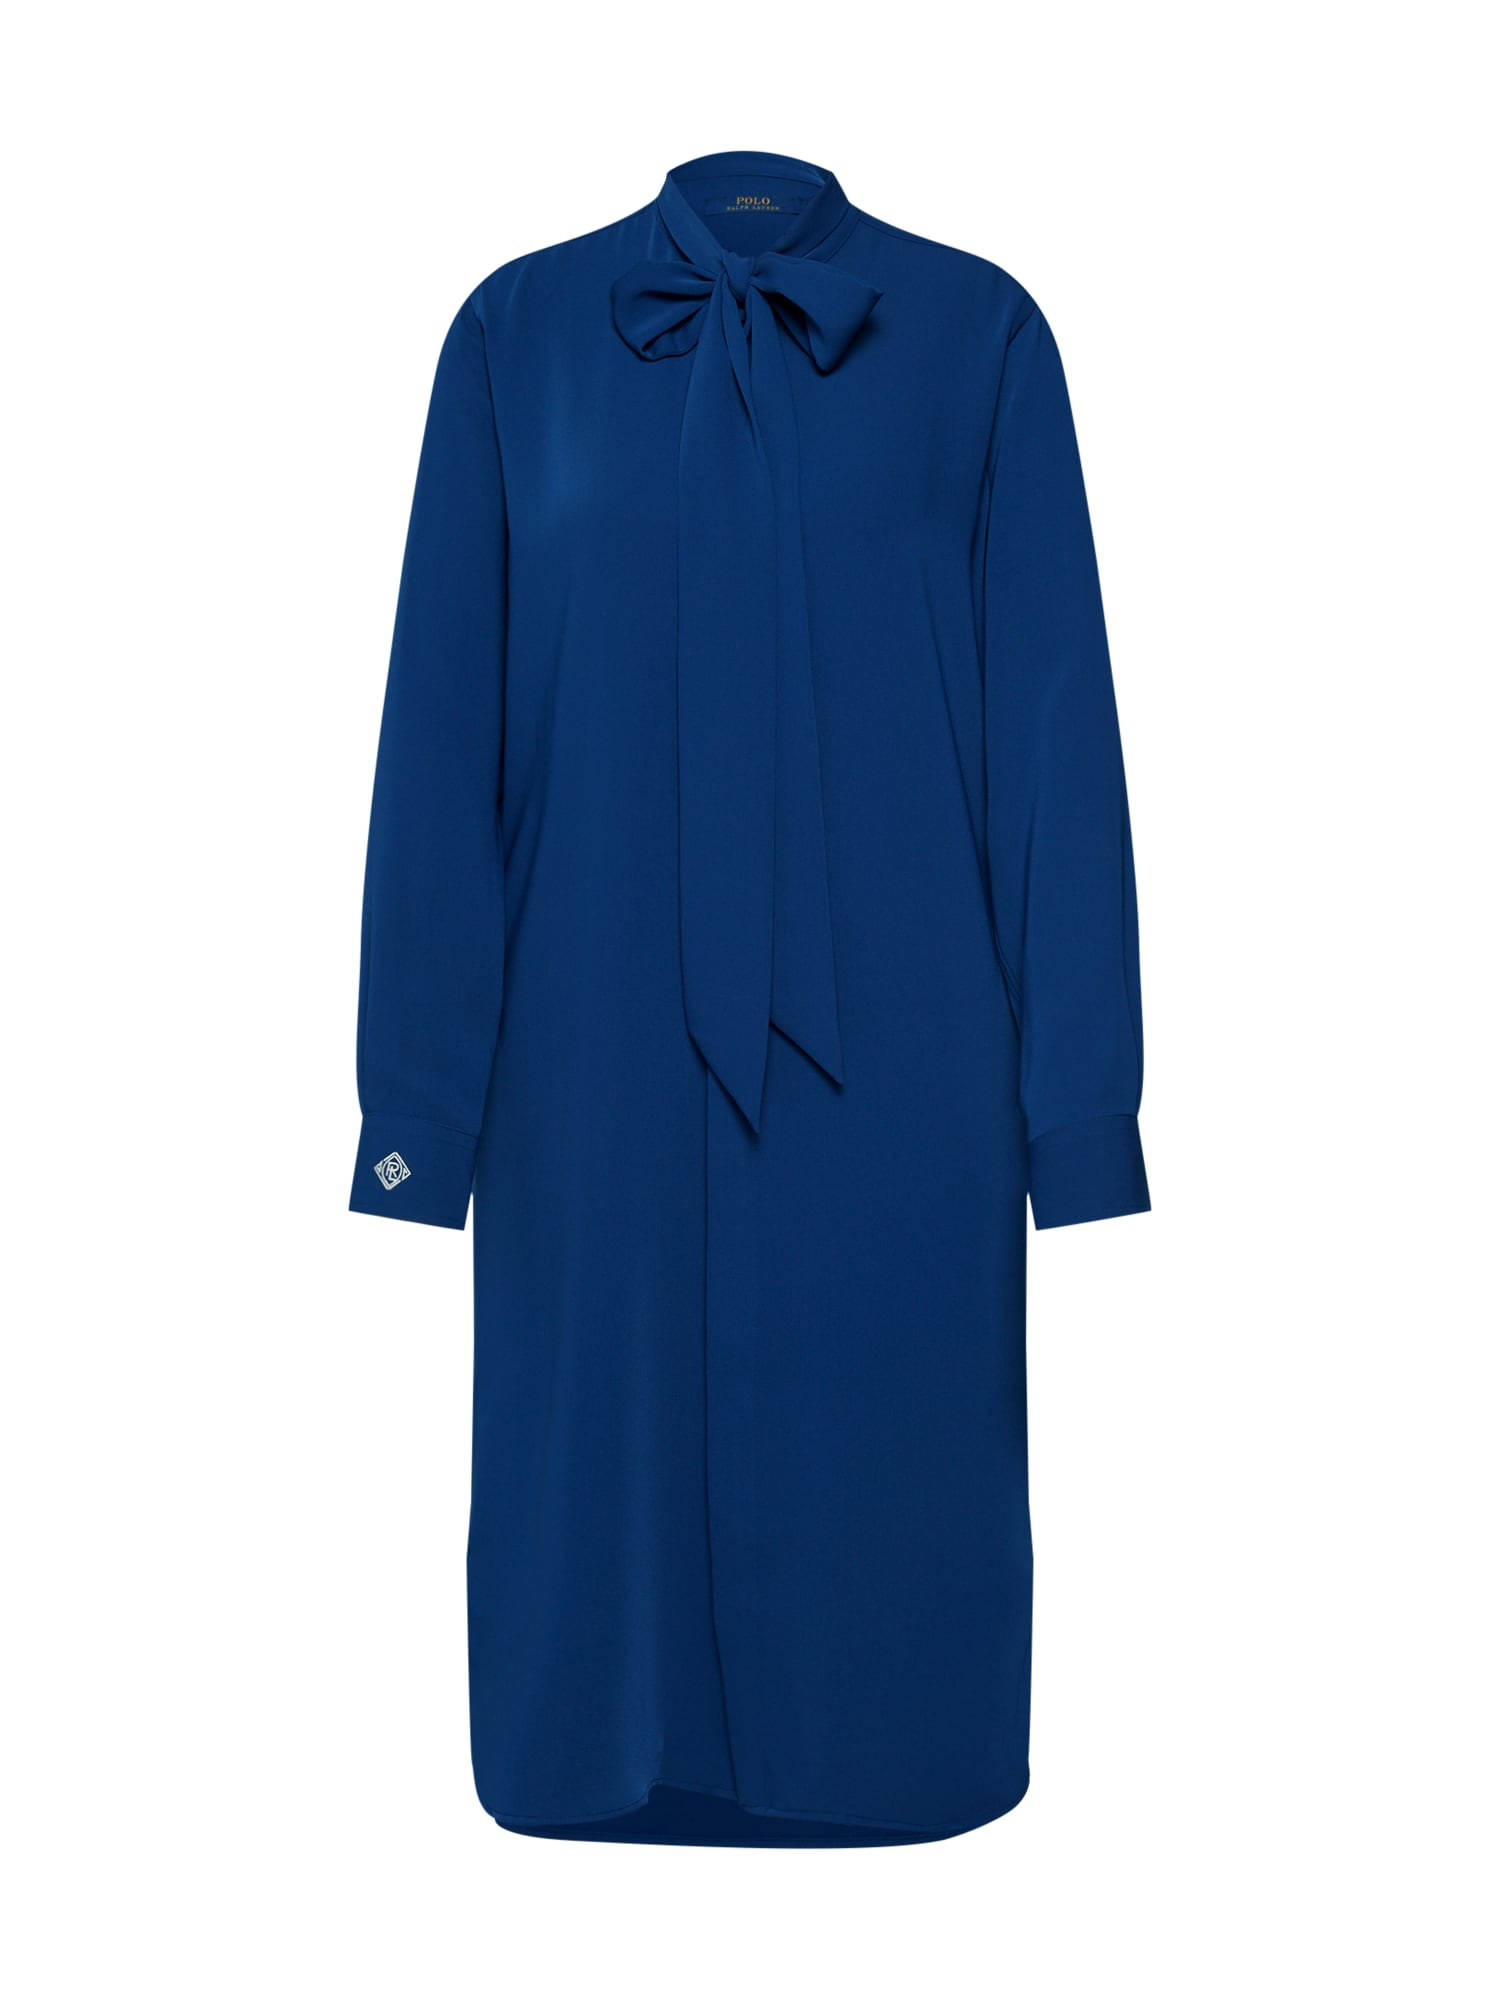 Košilové šaty LS IVY DR-LONG SLEEVE-CASUAL DRESS modrá POLO RALPH LAUREN